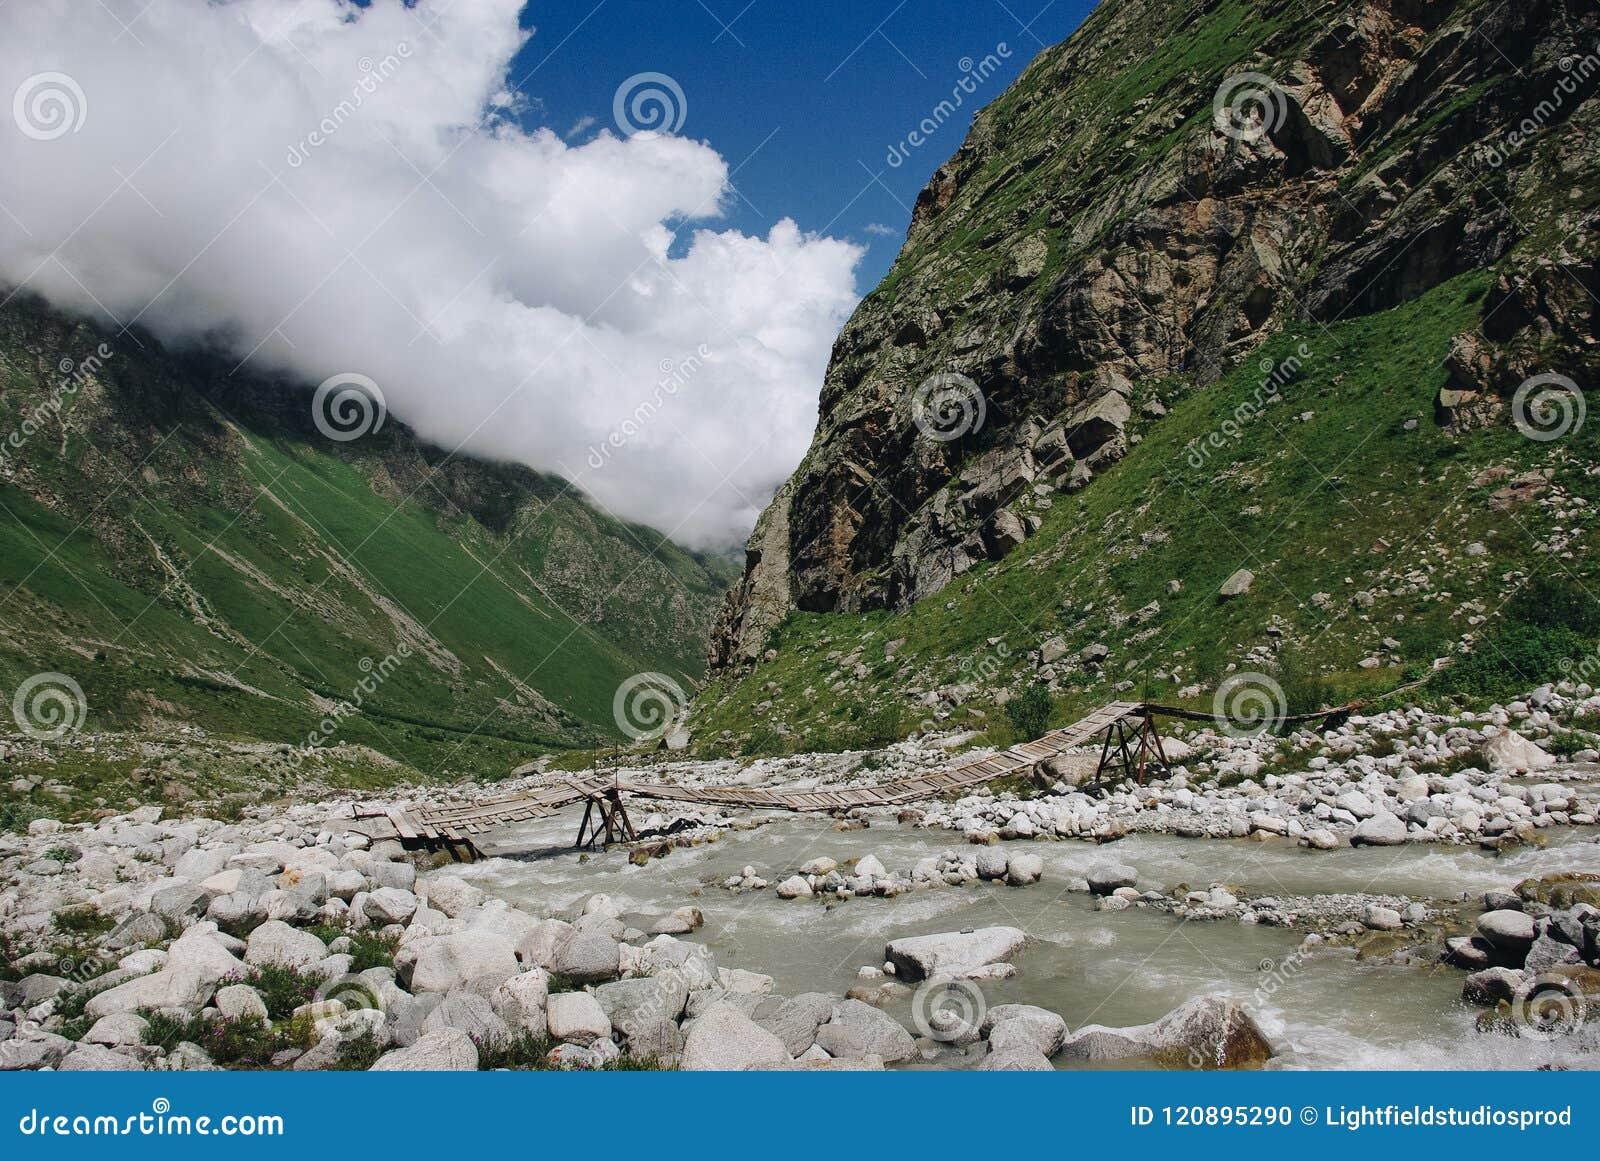 Träbro- och bergflod, rysk federation, Kaukasus,